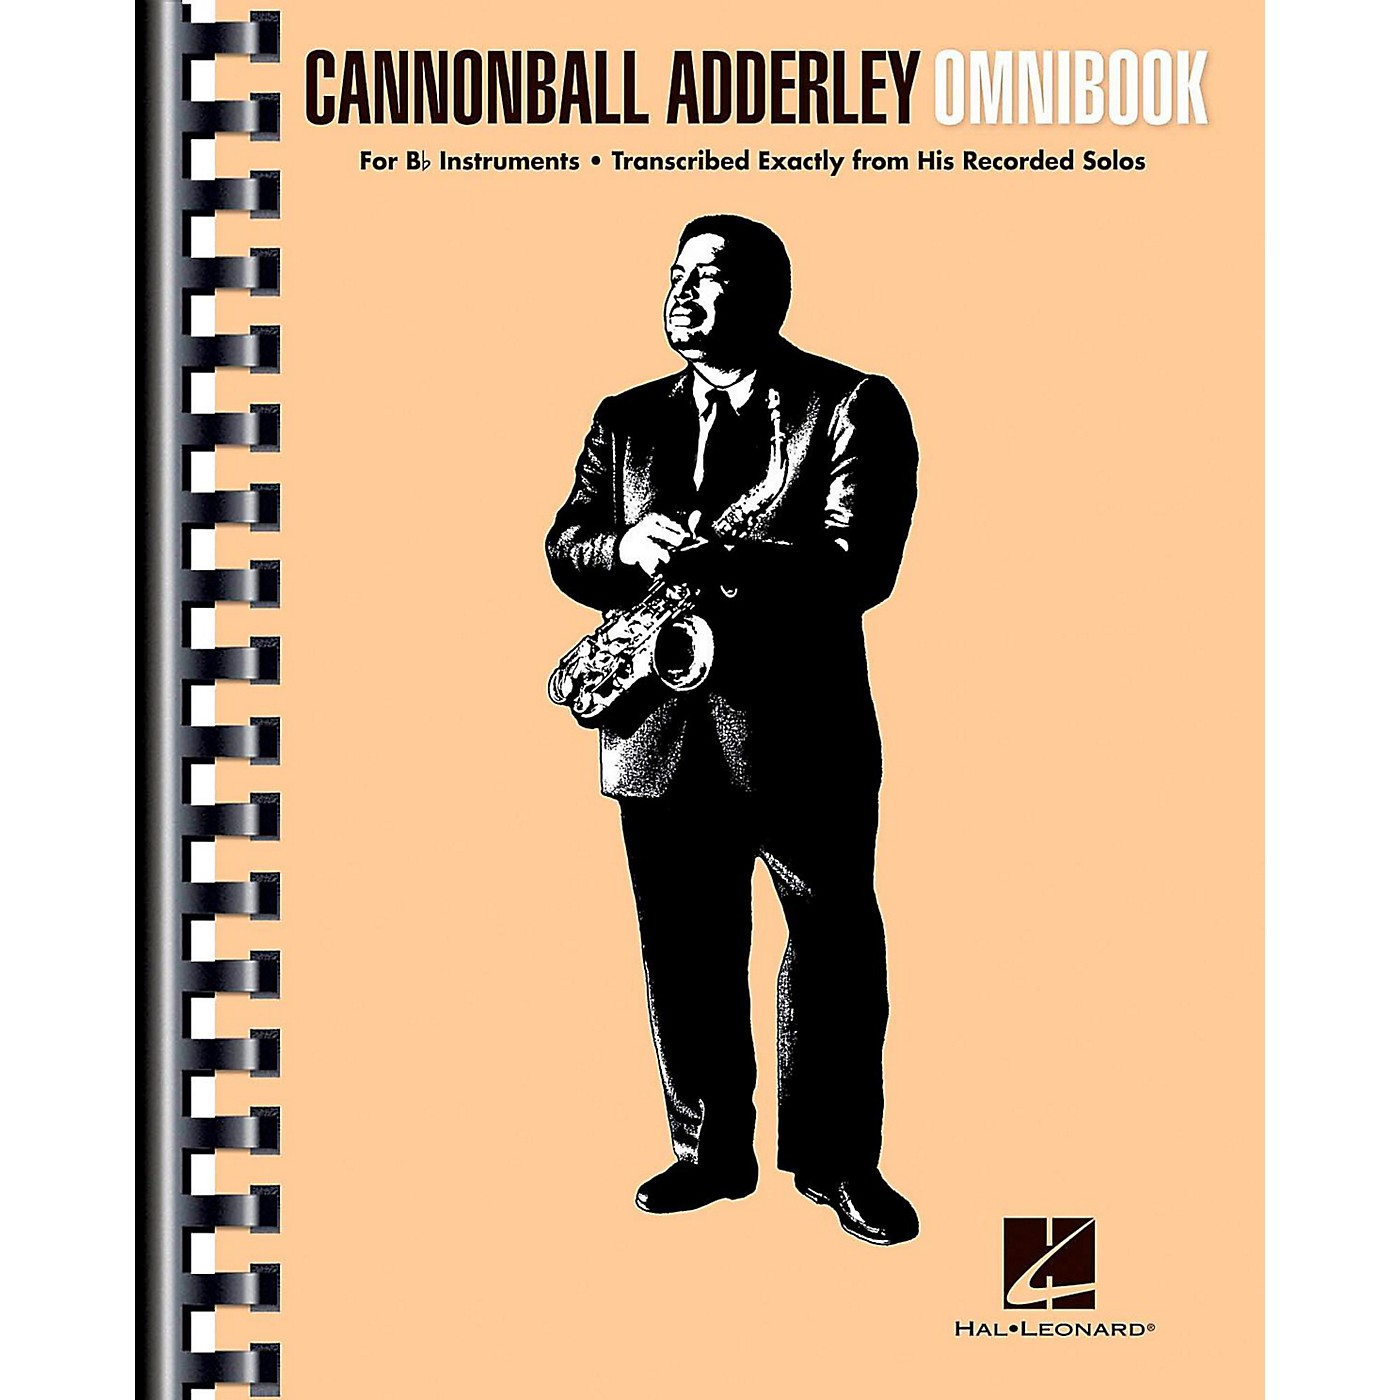 Hal Leonard Cannonball Adderley - Omnibook for B-Flat Instruments thumbnail